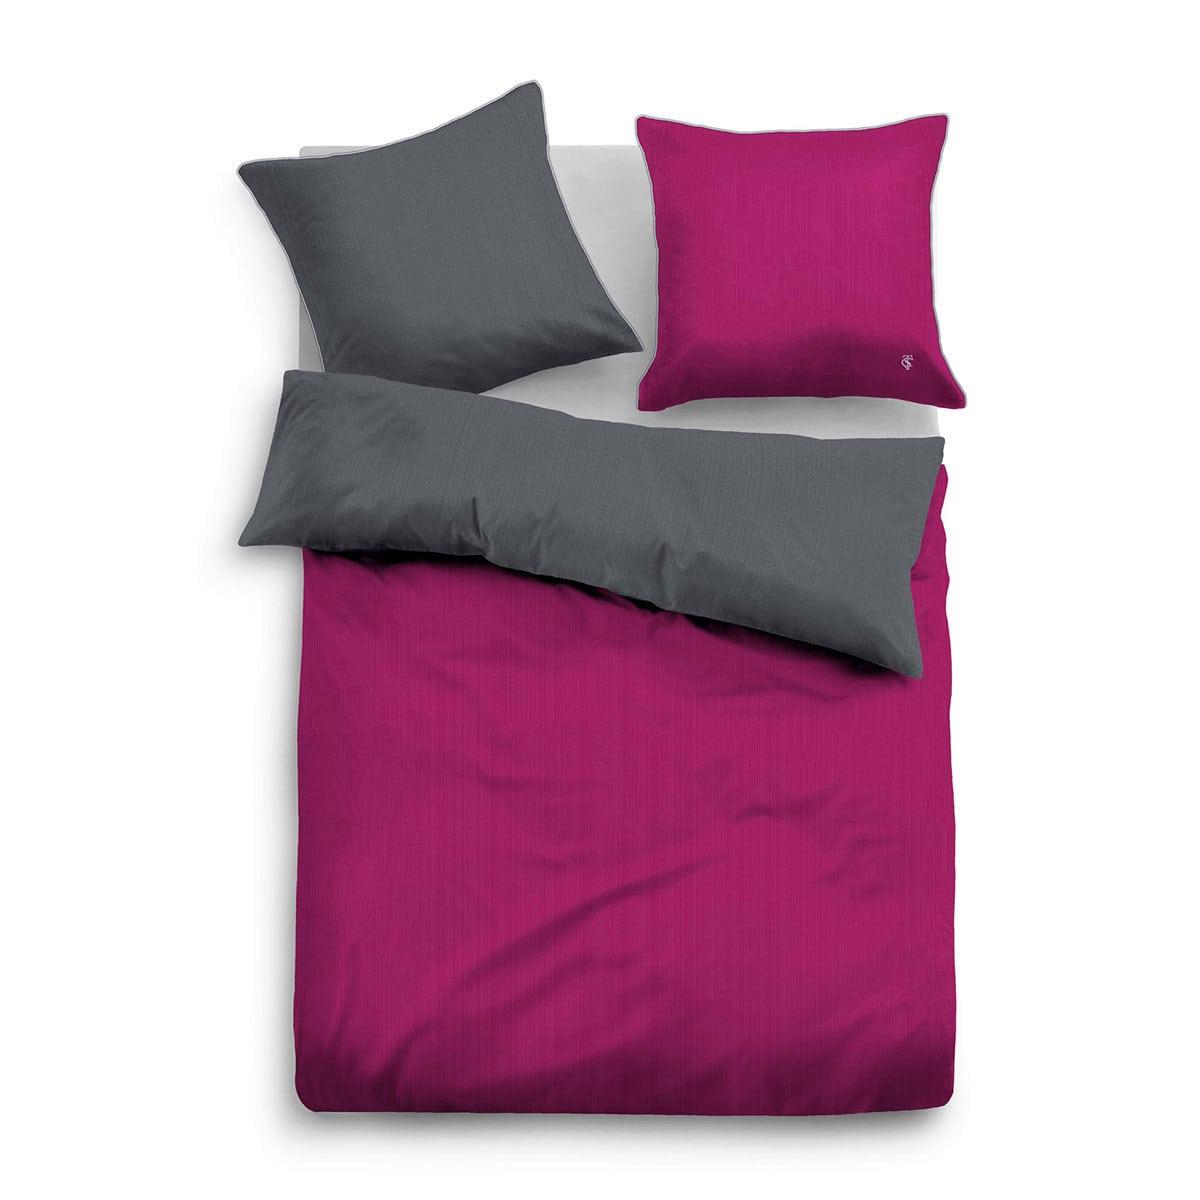 tom tailor uni wendebettw sche beere g nstig online kaufen bei bettwaren shop. Black Bedroom Furniture Sets. Home Design Ideas